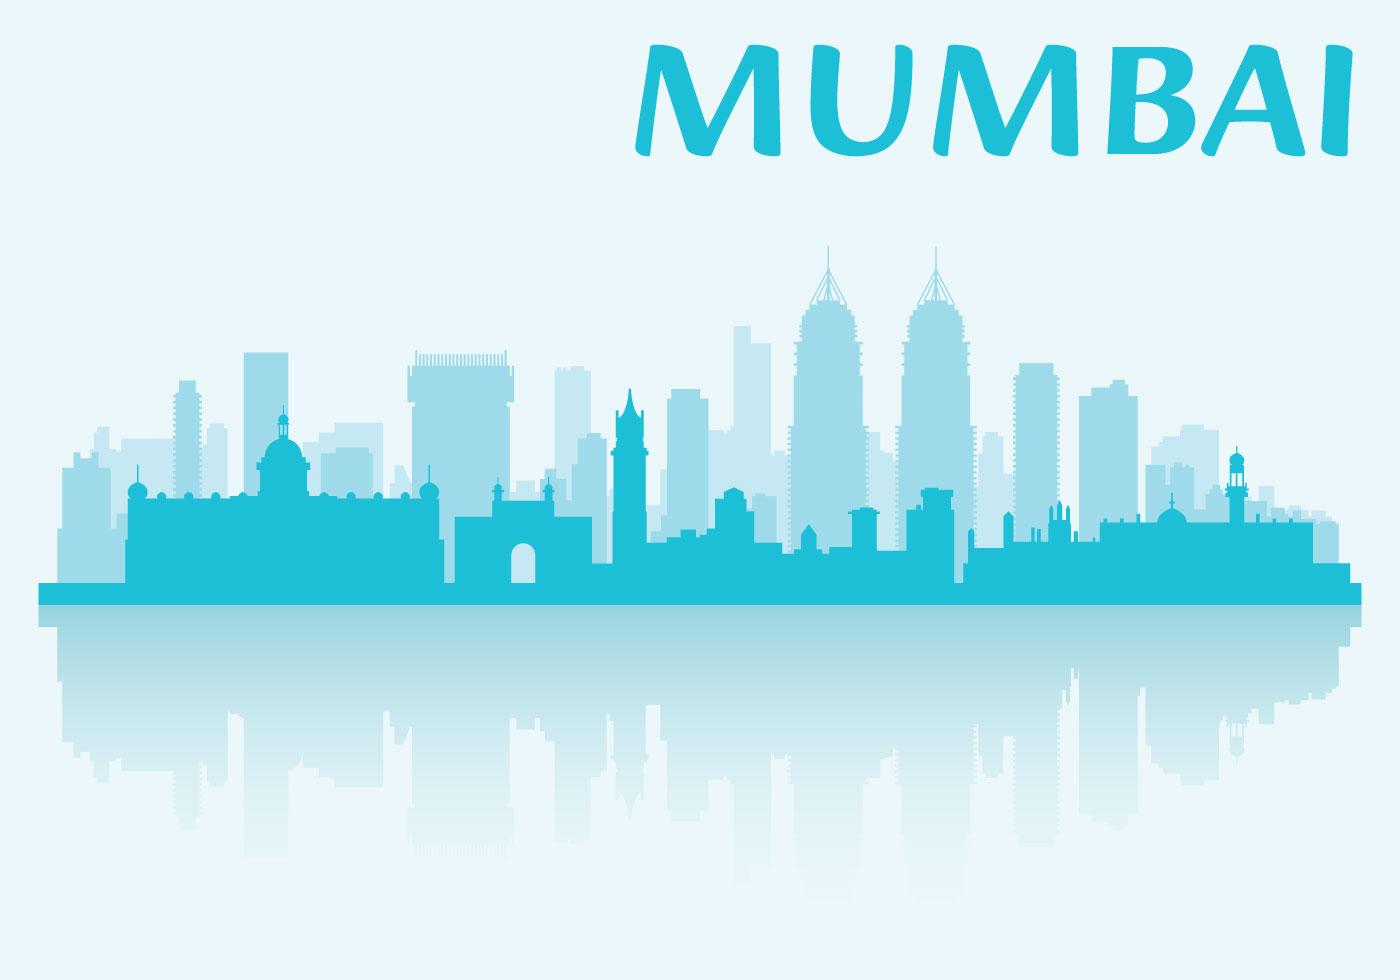 Mumbai City Wallpaper Hd Mumbai Skyline Download Free Vector Art Stock Graphics